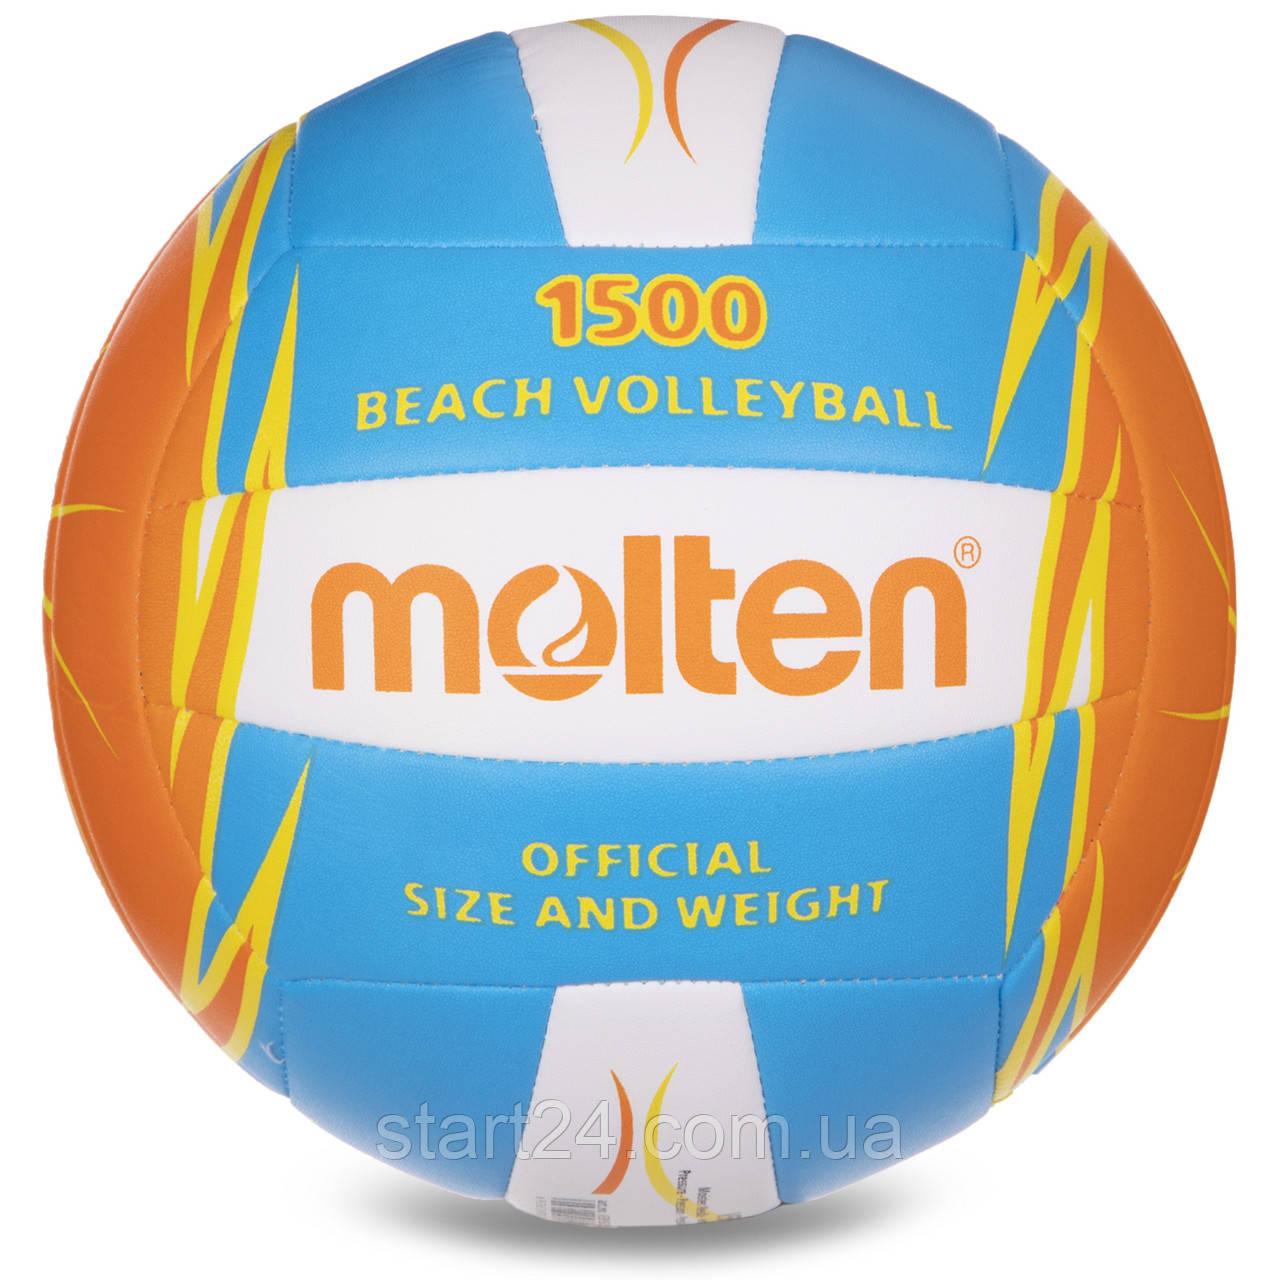 М'яч для пляжного волейболу PU MOLTEN V5B1500-CO-SH (PU, №5, 3 шари, зшитий вручну)